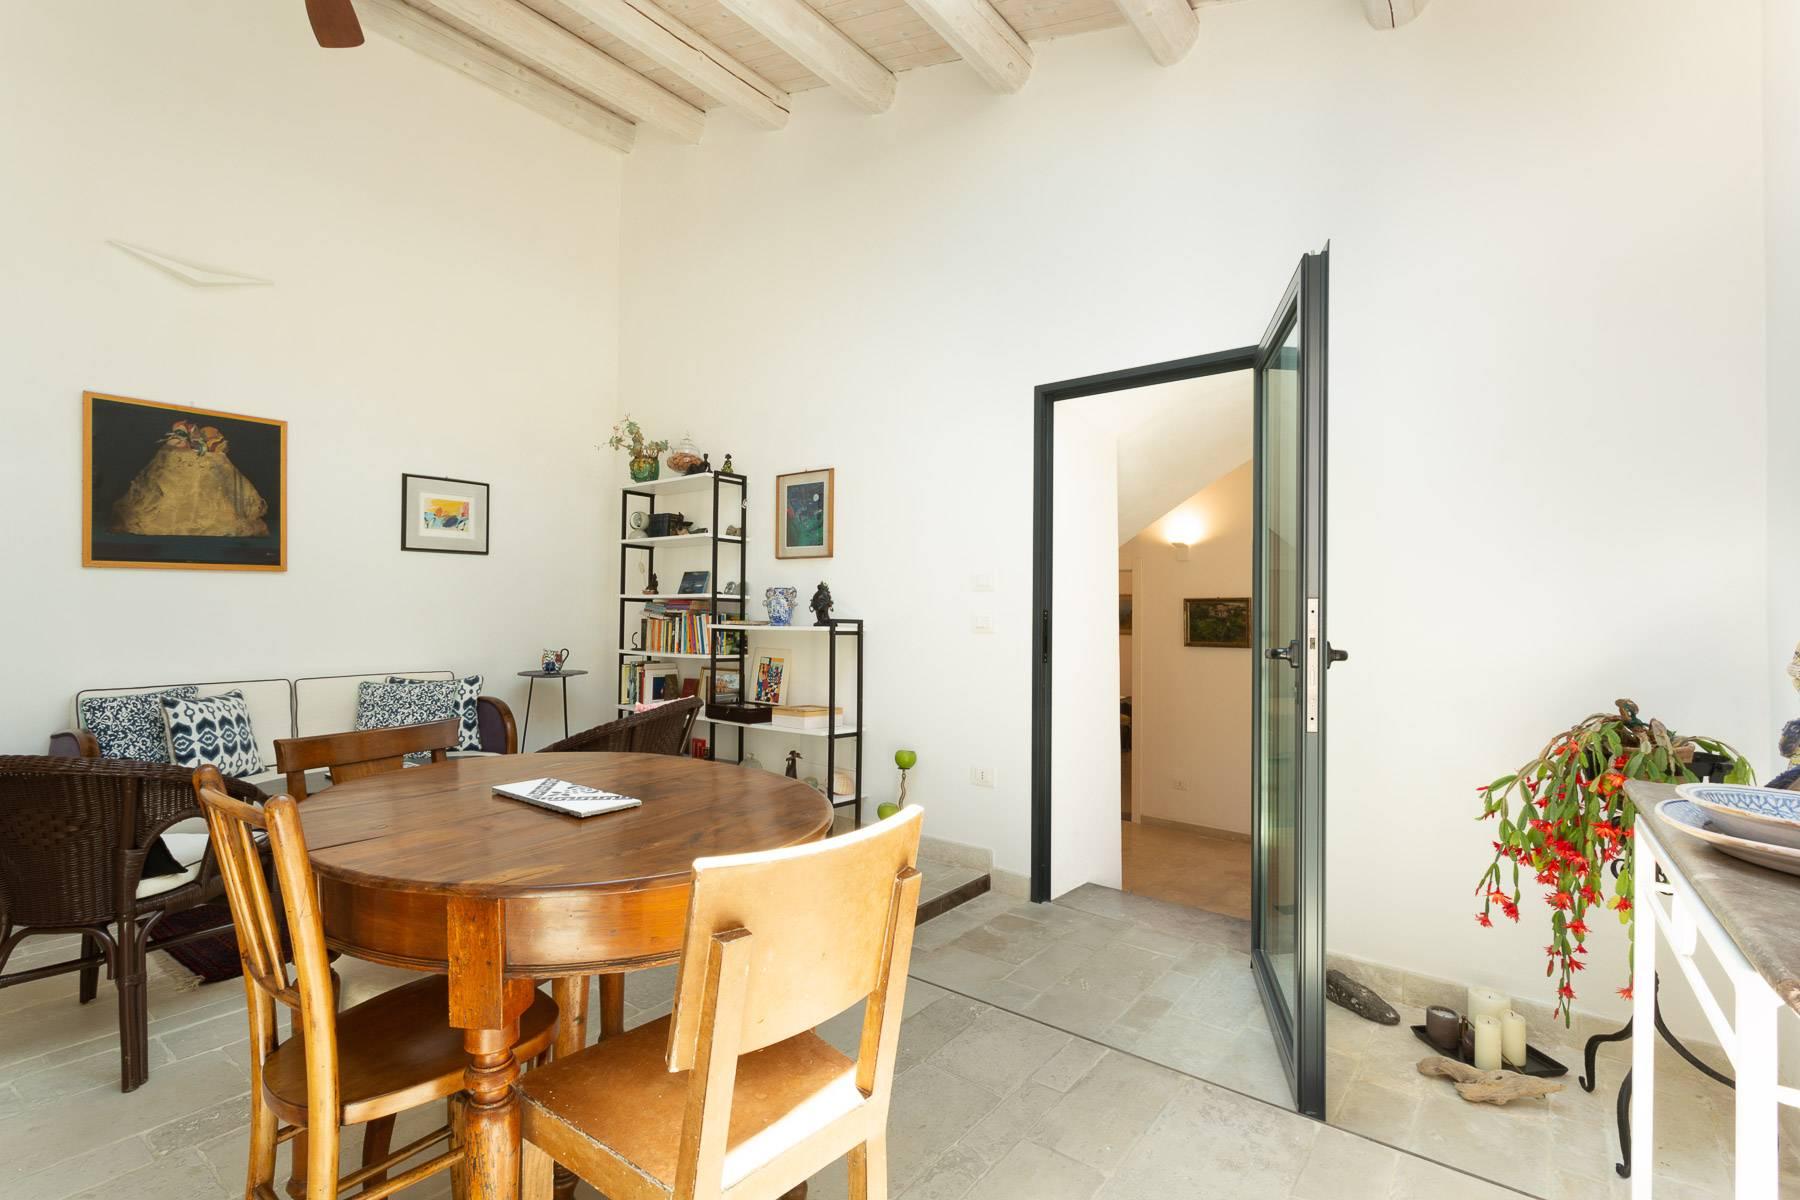 Casa indipendente in Vendita a Noto: 5 locali, 171 mq - Foto 9